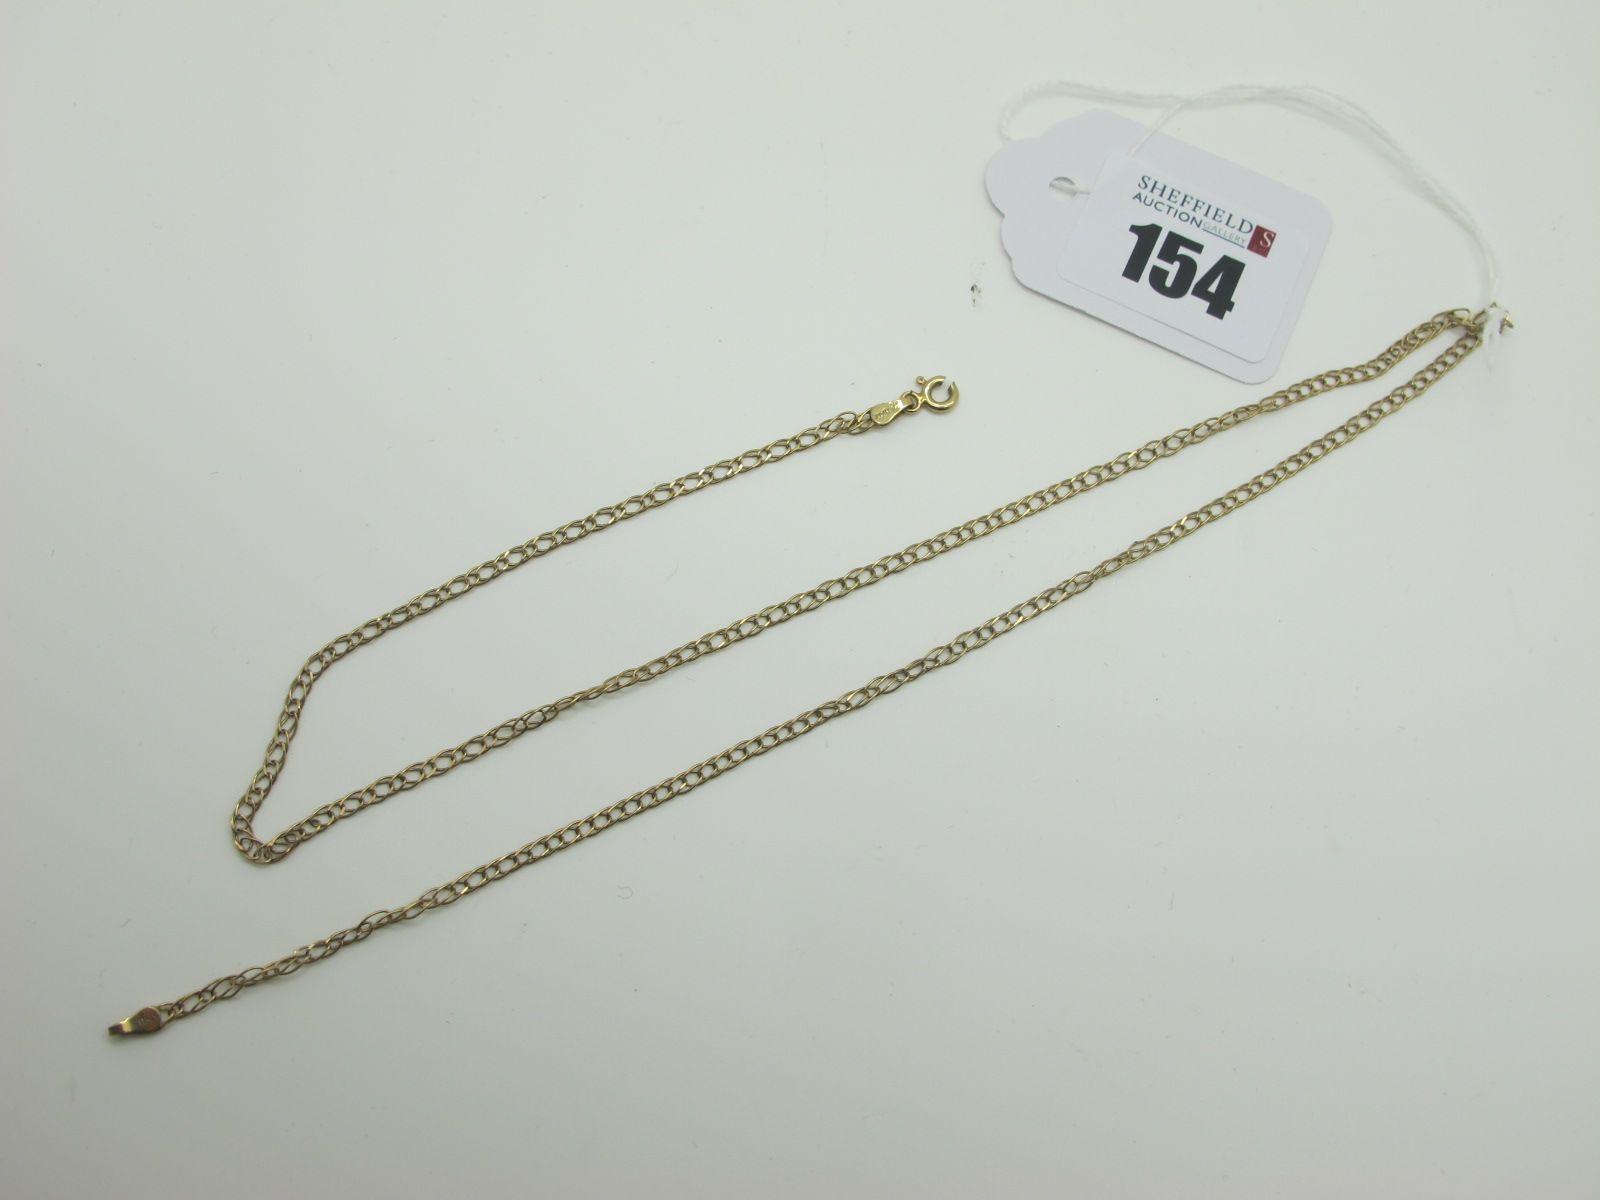 A 9ct Gold Chain, 51.5cm long (clasp broken) (2.8grams).